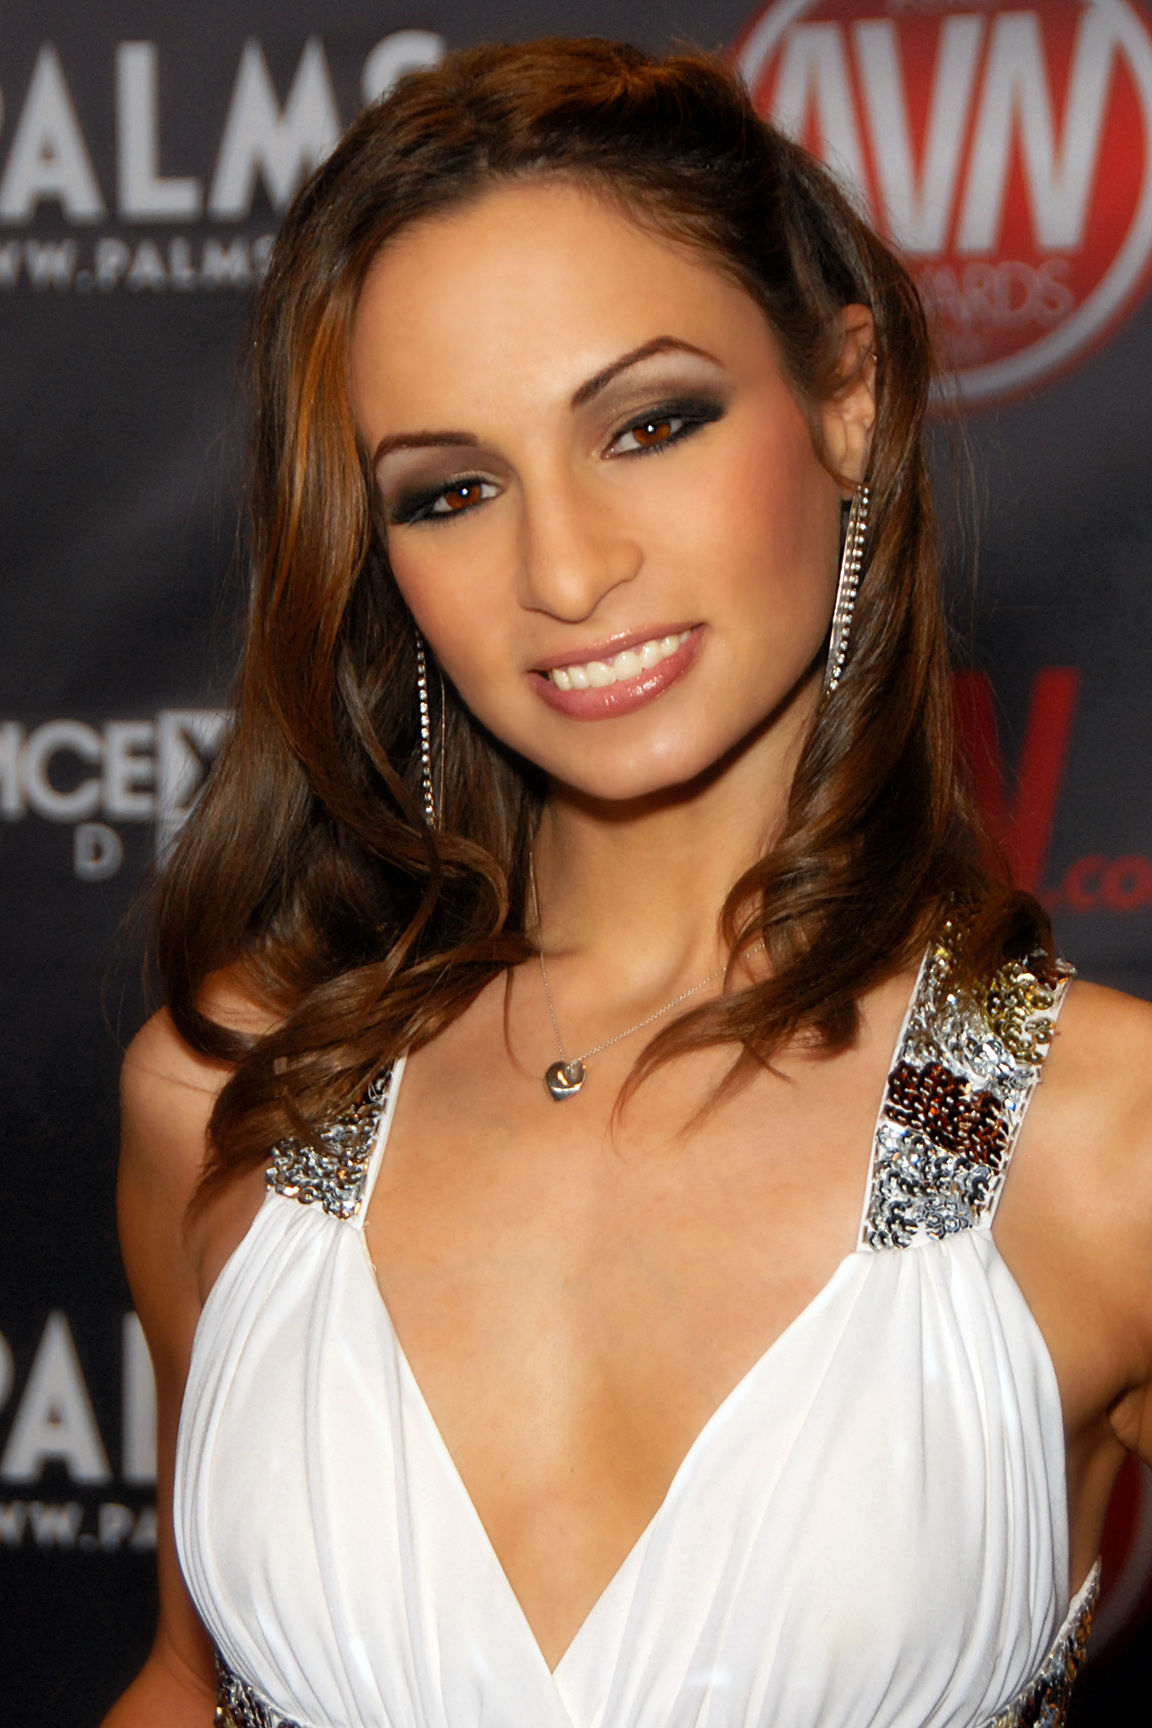 Photo of Amber Rayne: American pornographic actress